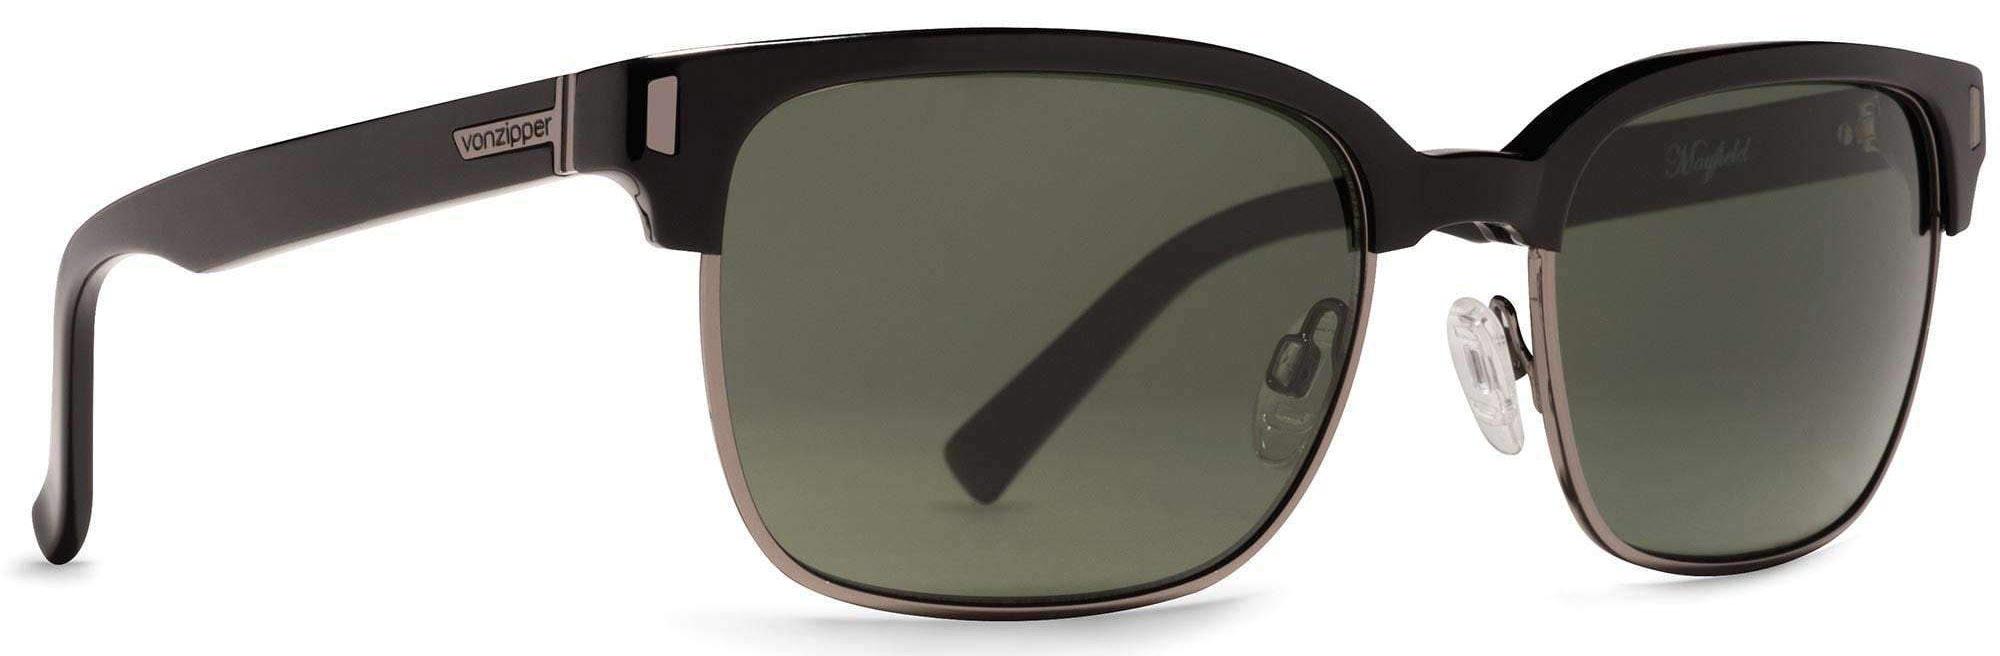 Von Zipper Mayfield Vintage Grey Lens Sunglasses, Black Gloss